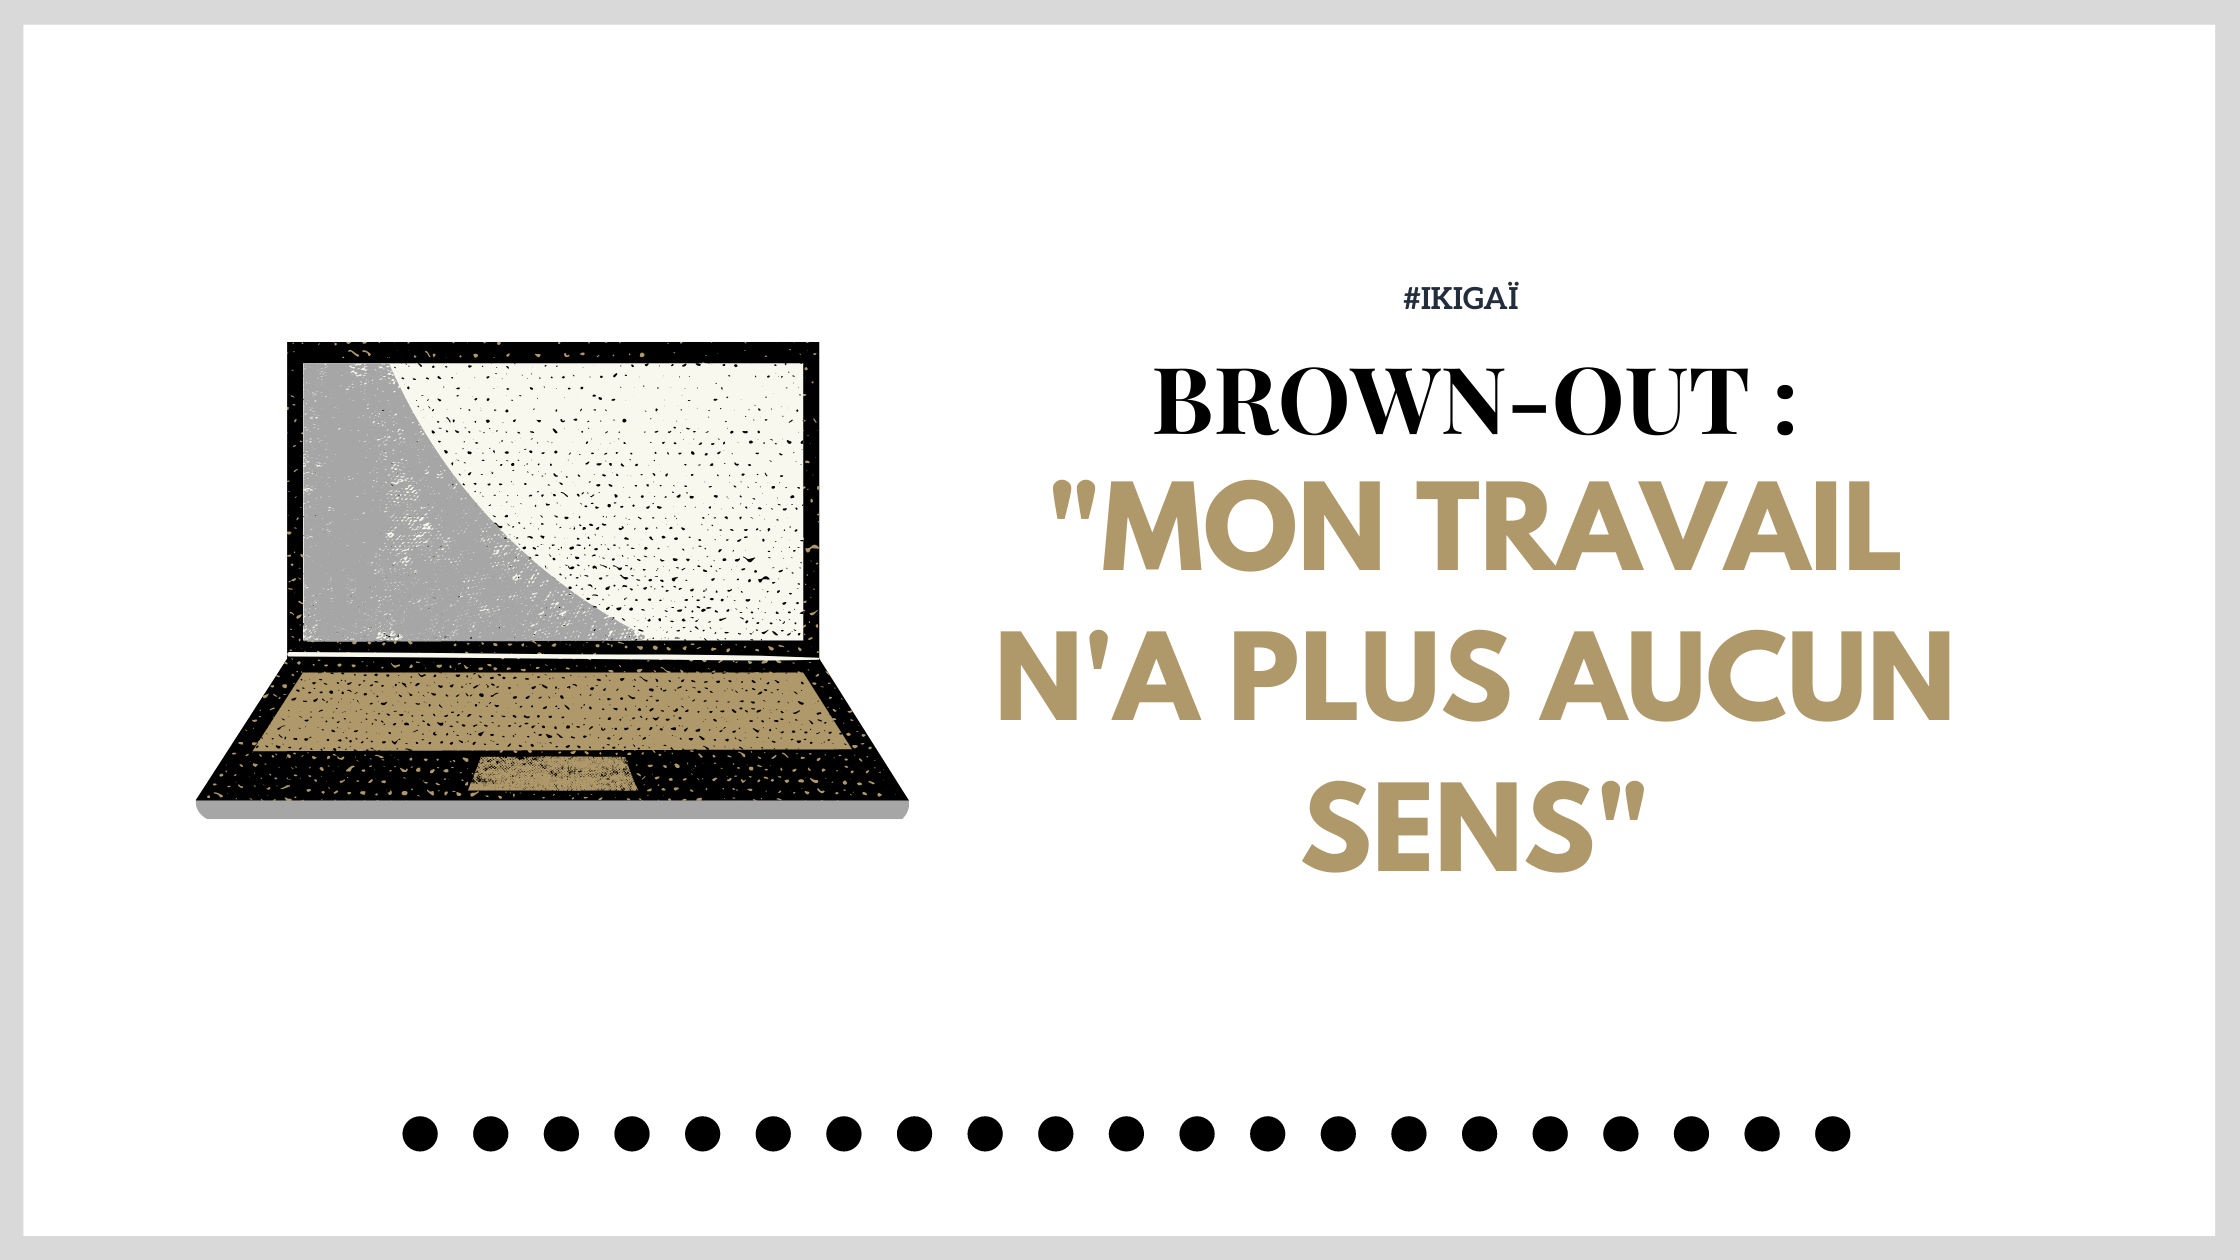 Le brown out : mon travail n'a plus aucun sens